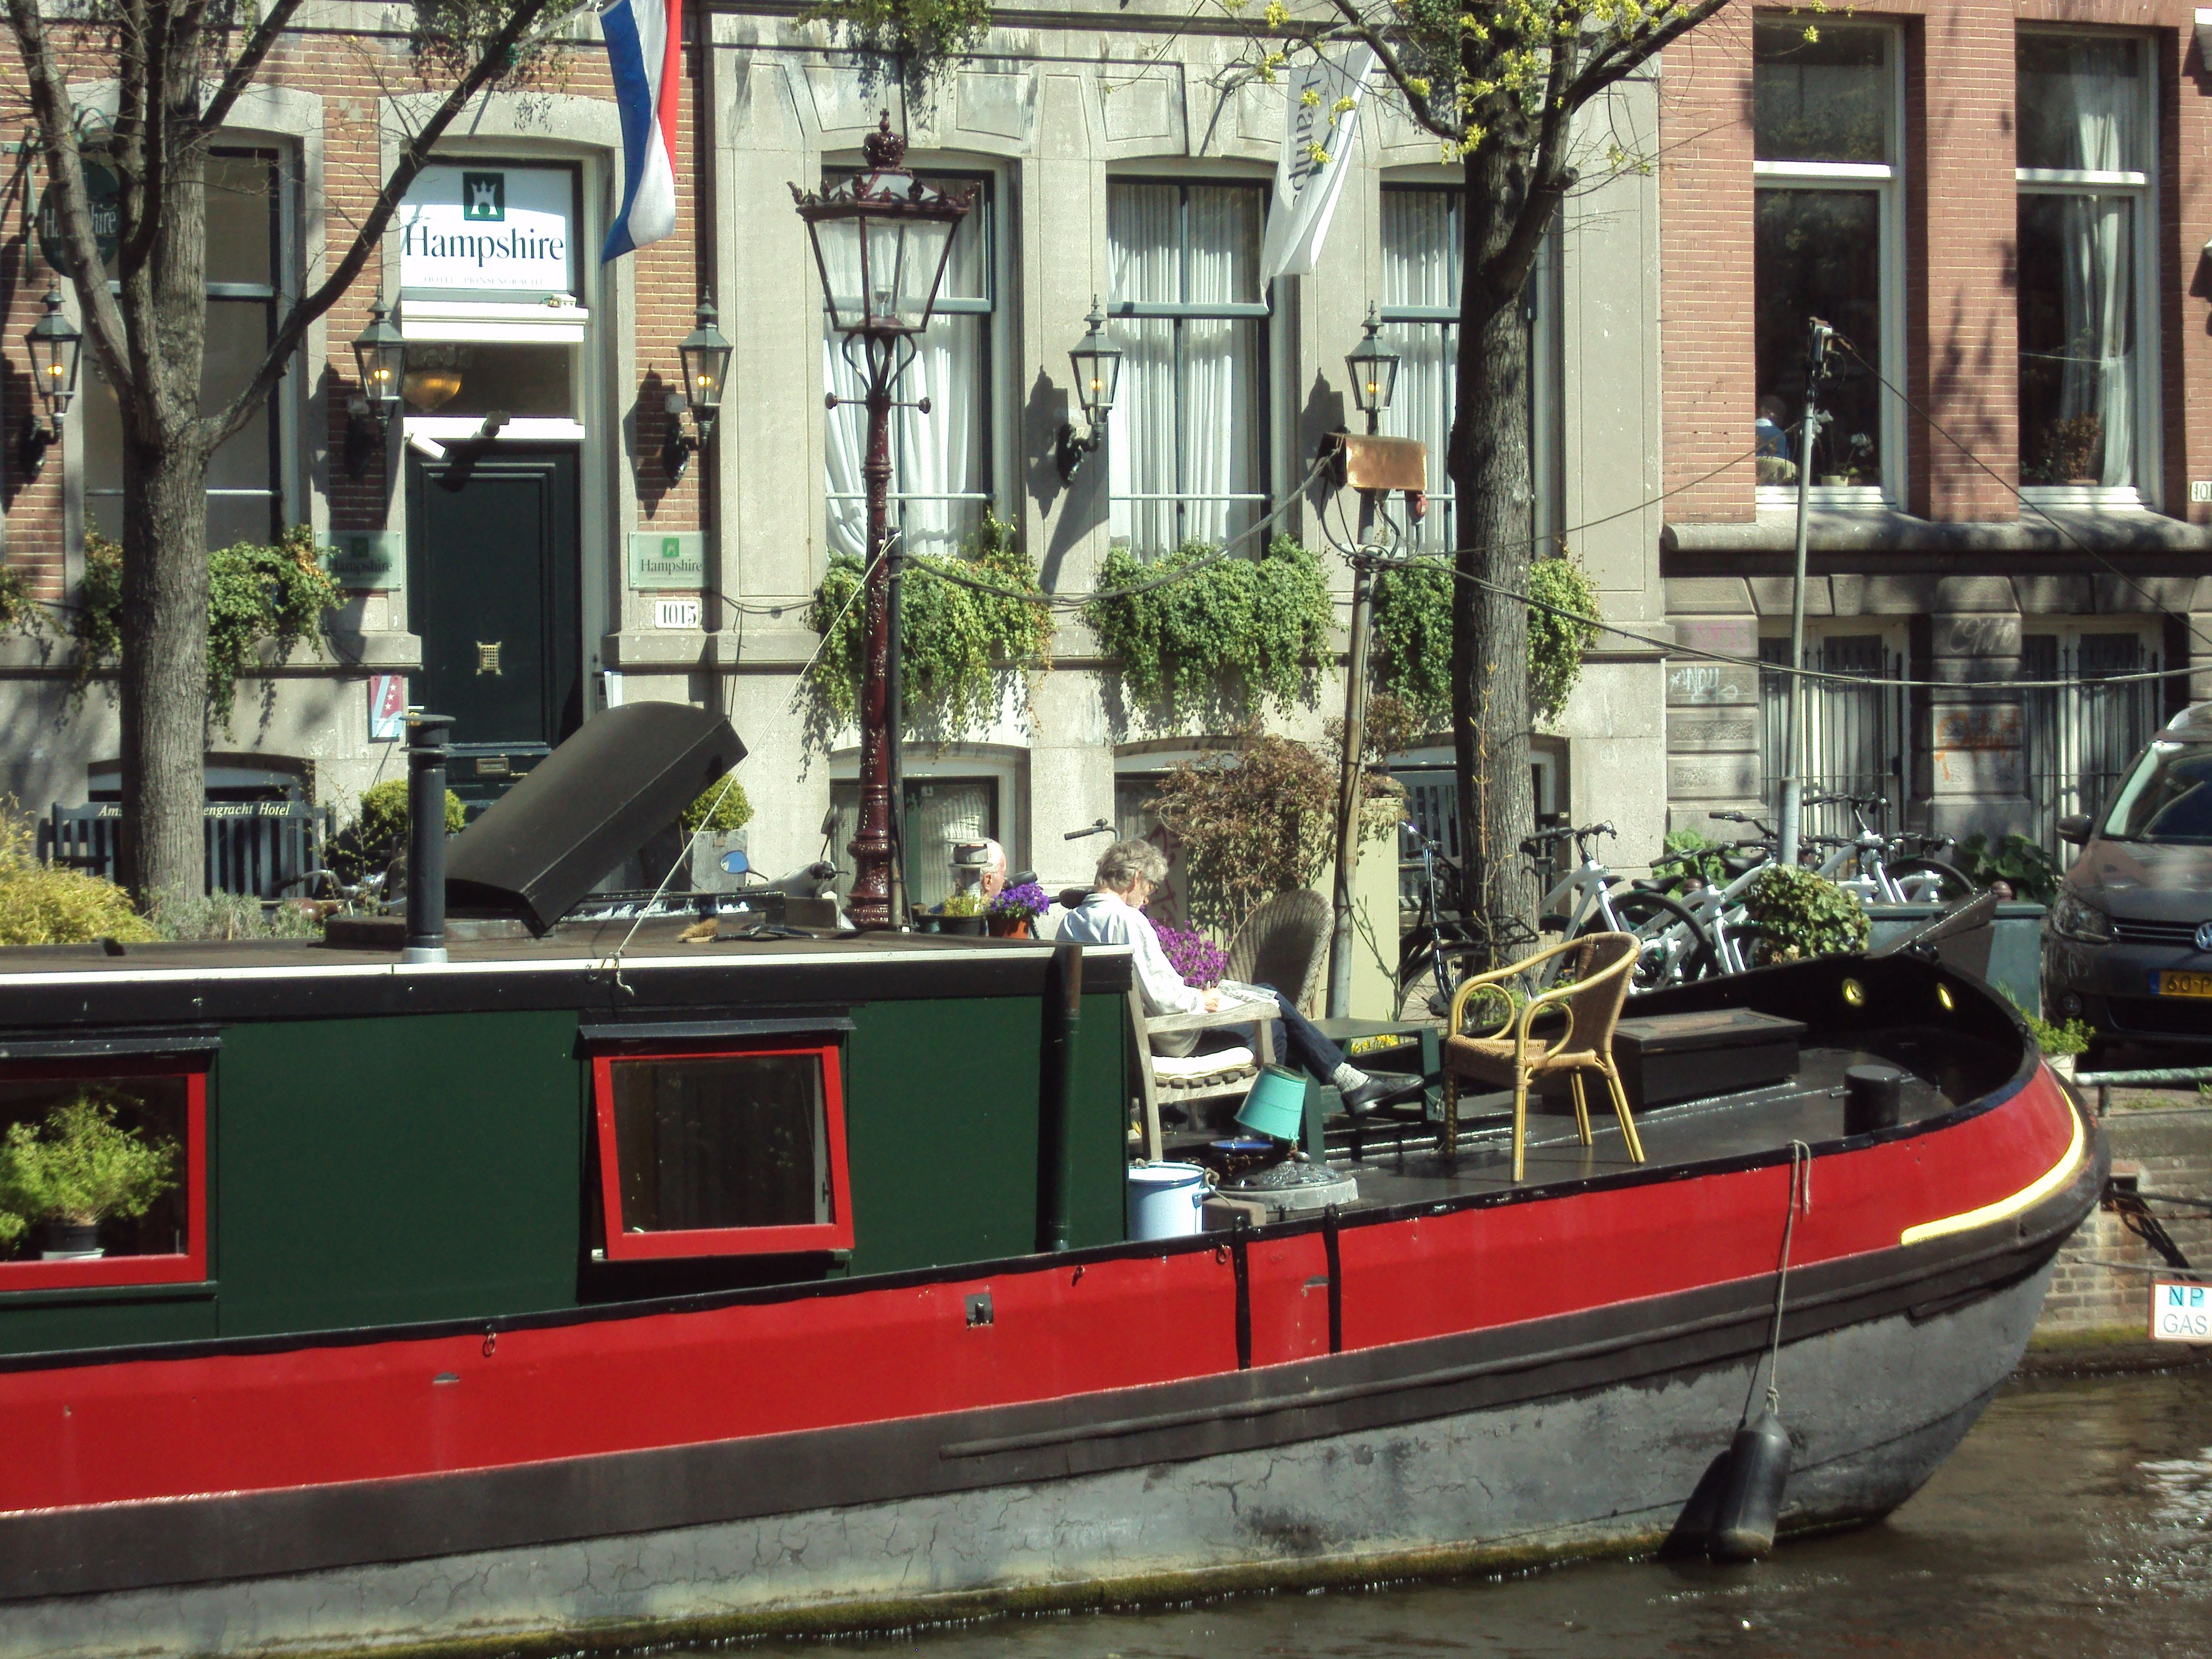 Canais, barcos, arquitetura de Amsterdã